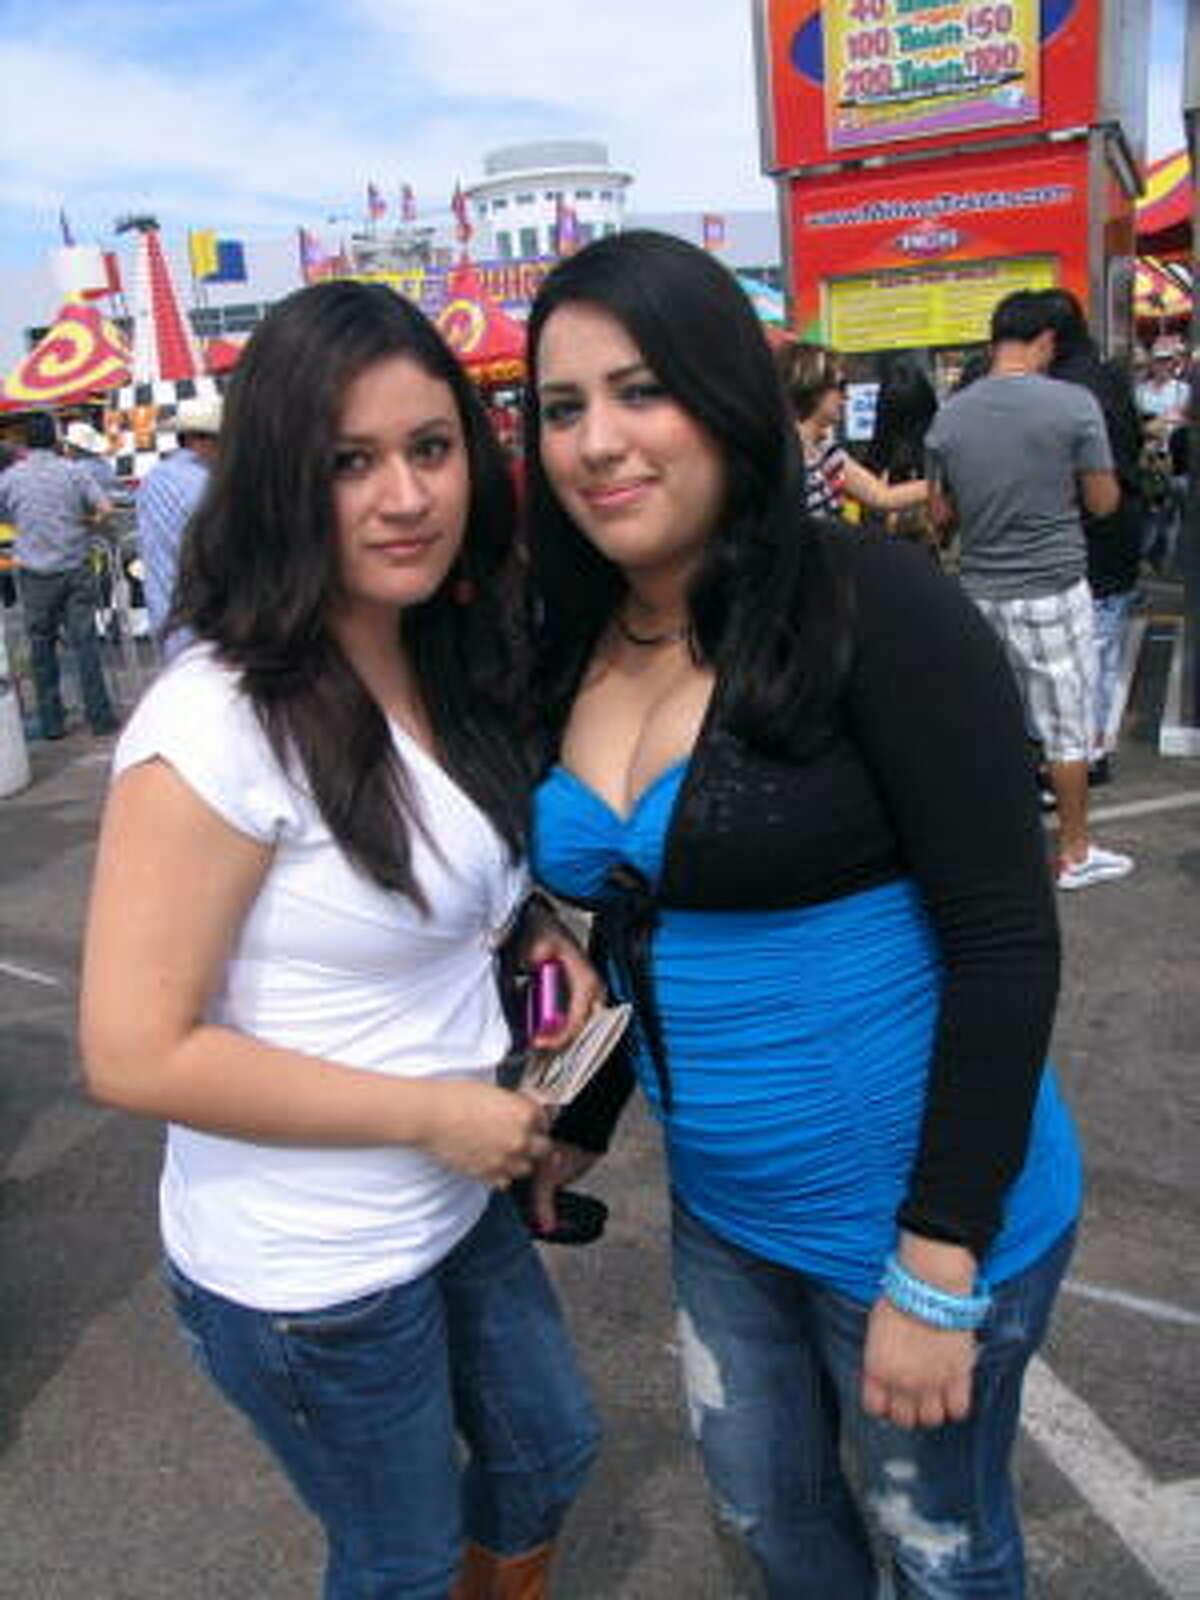 Cynthia Rivera, left, and Rosie Loera